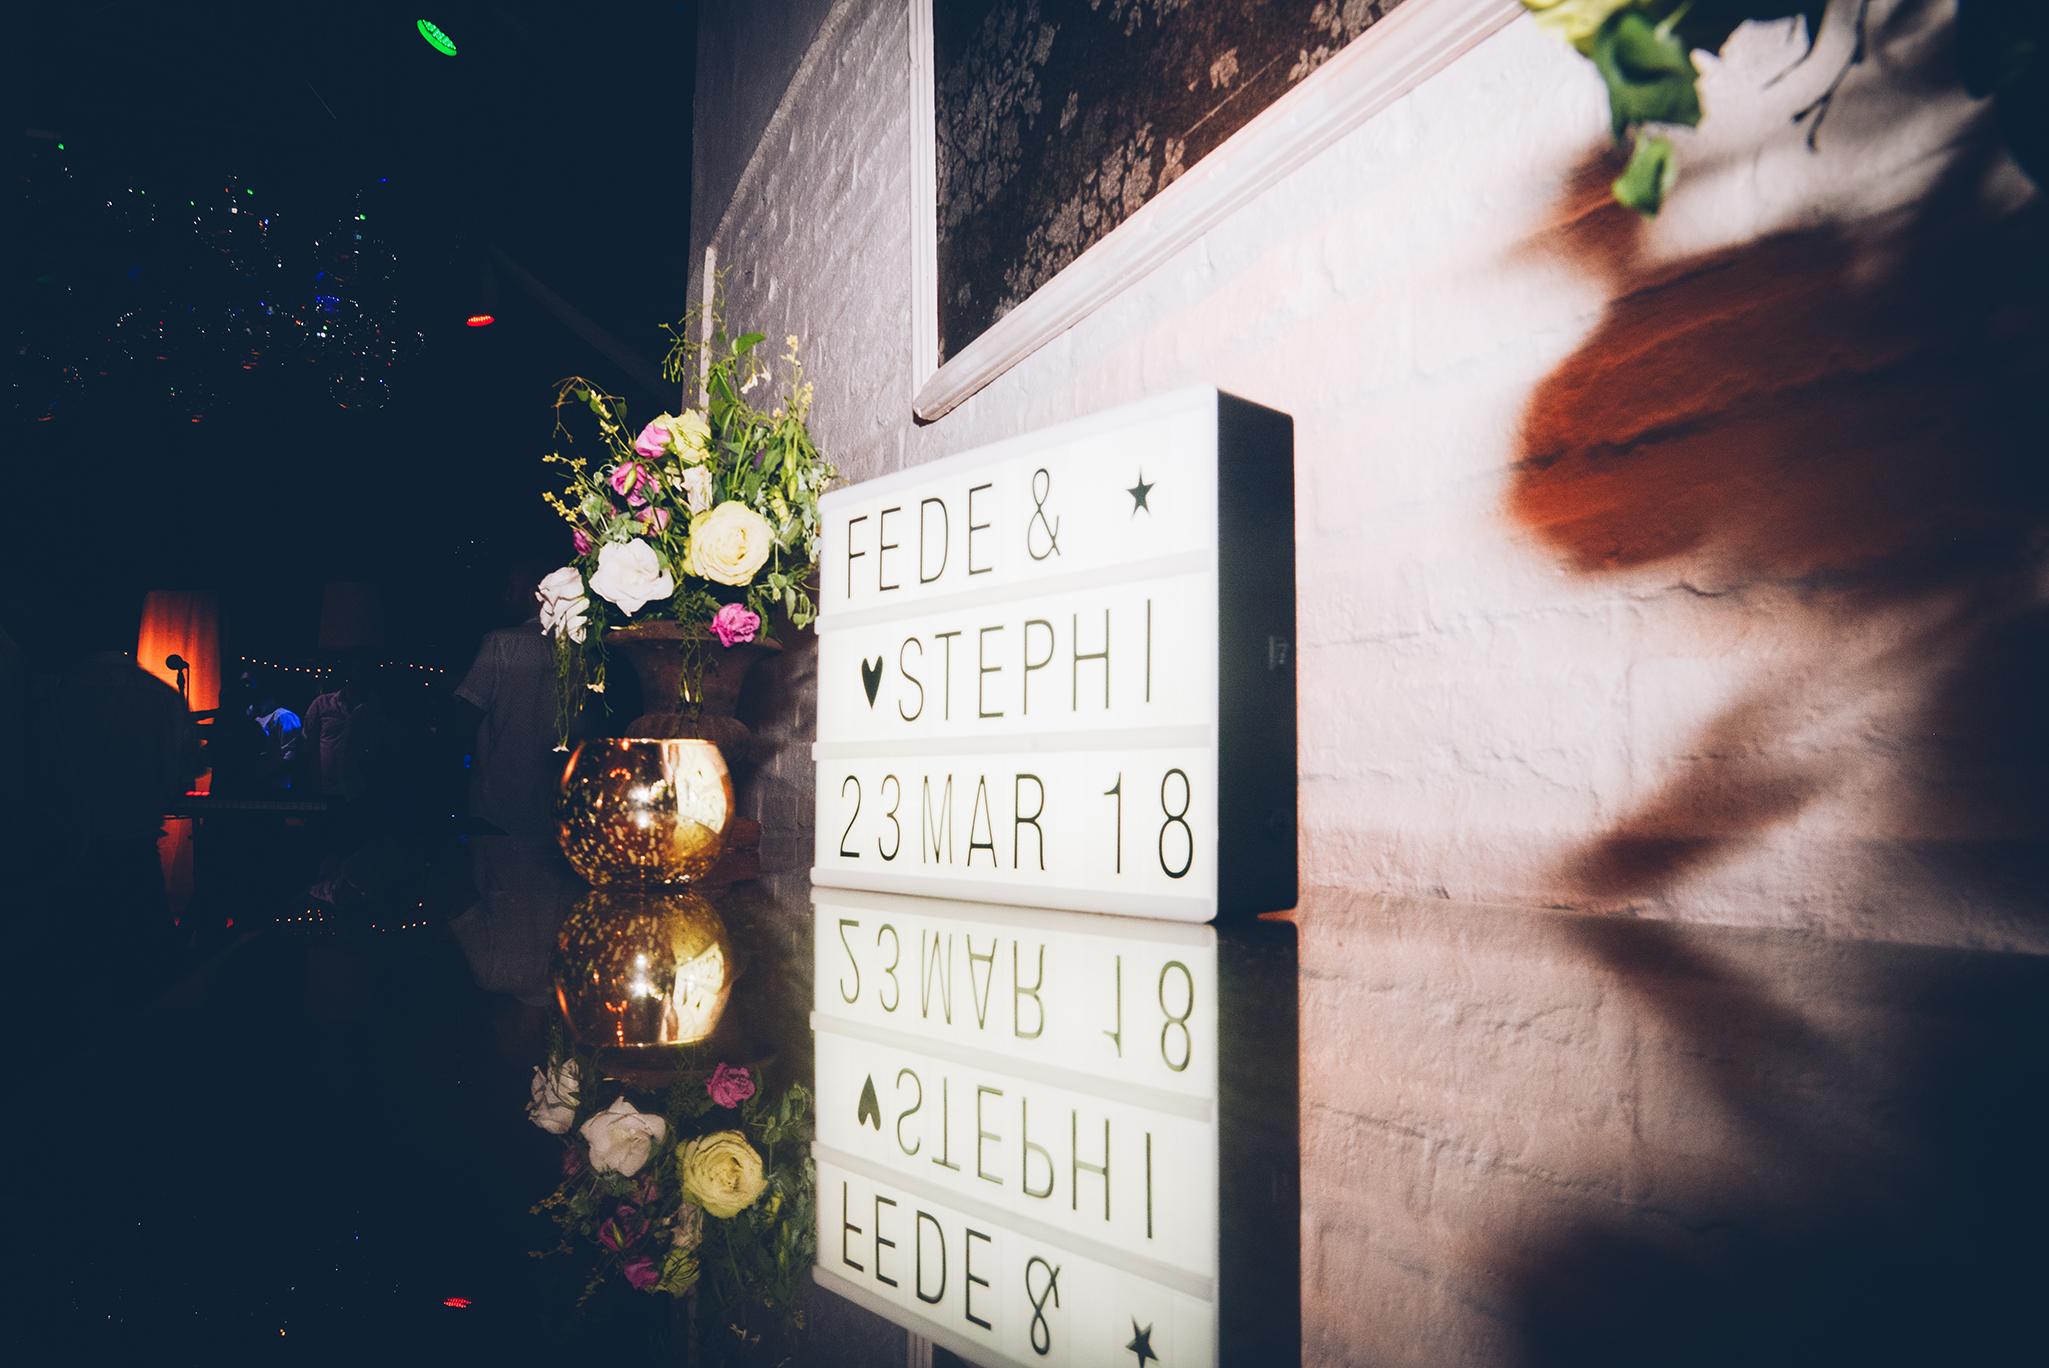 Stephi-&-Fede-(466-of-655)